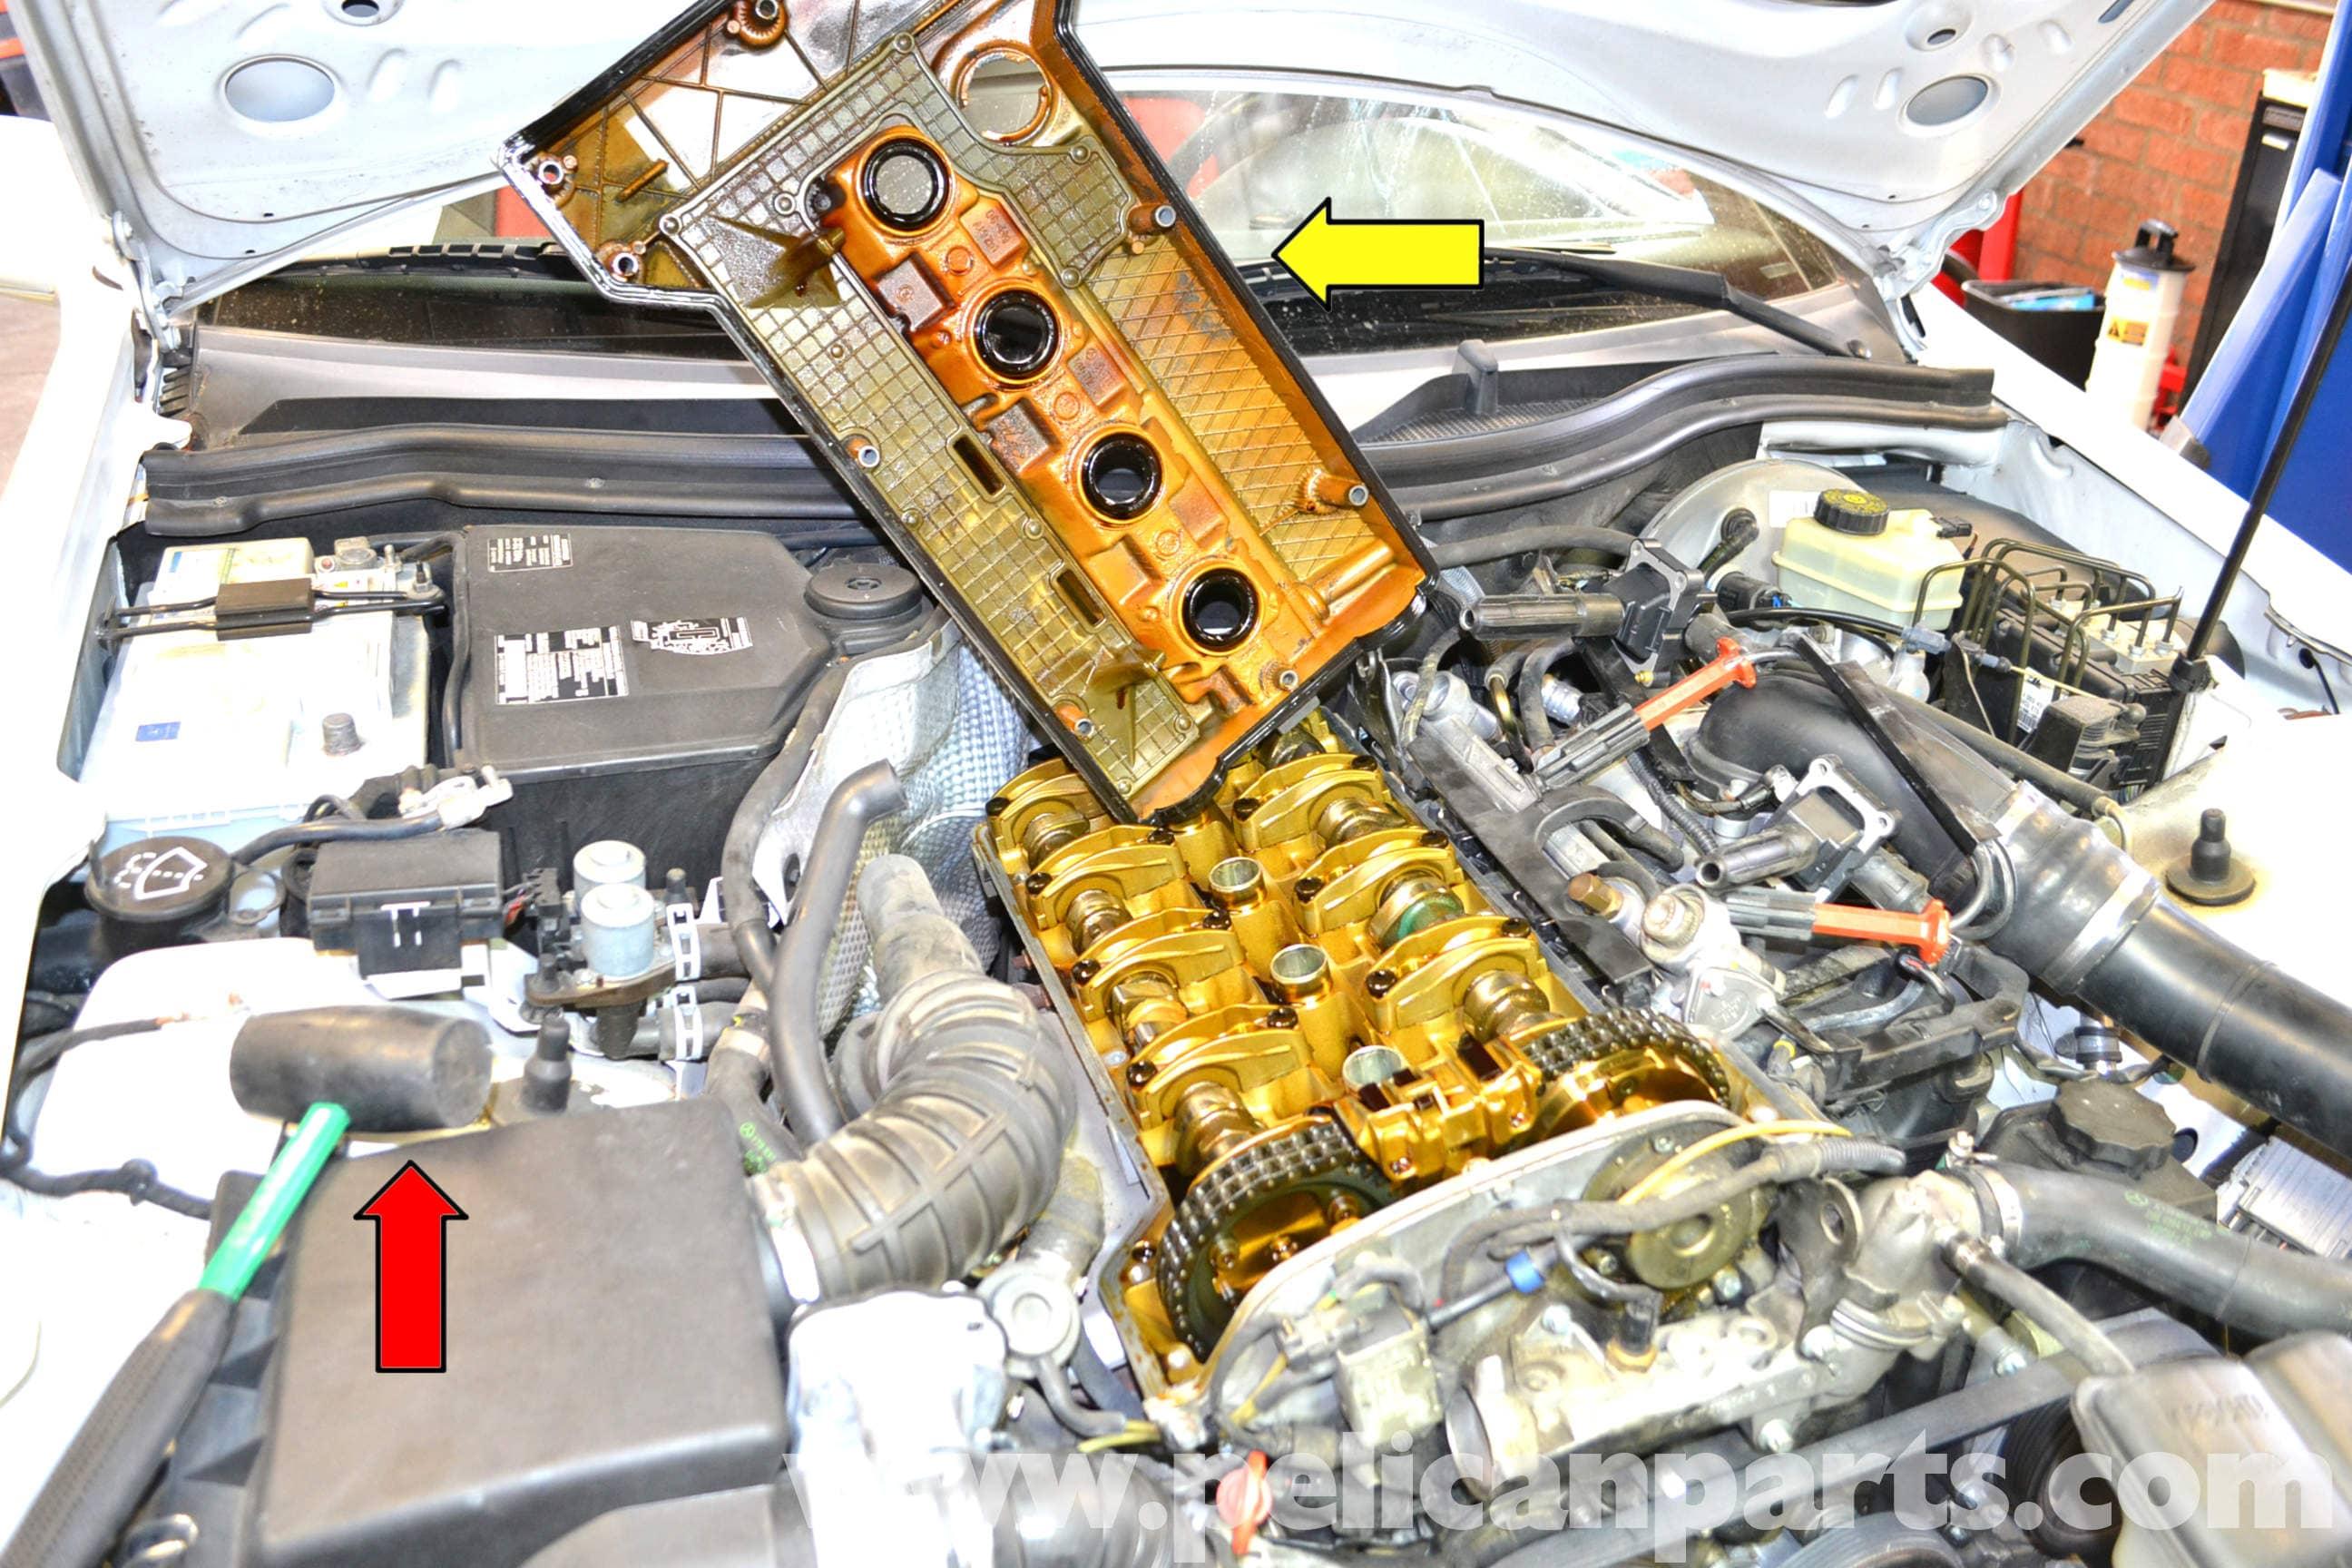 Mercedes Benz Slk 230 Valve Cover Gasket Replacement